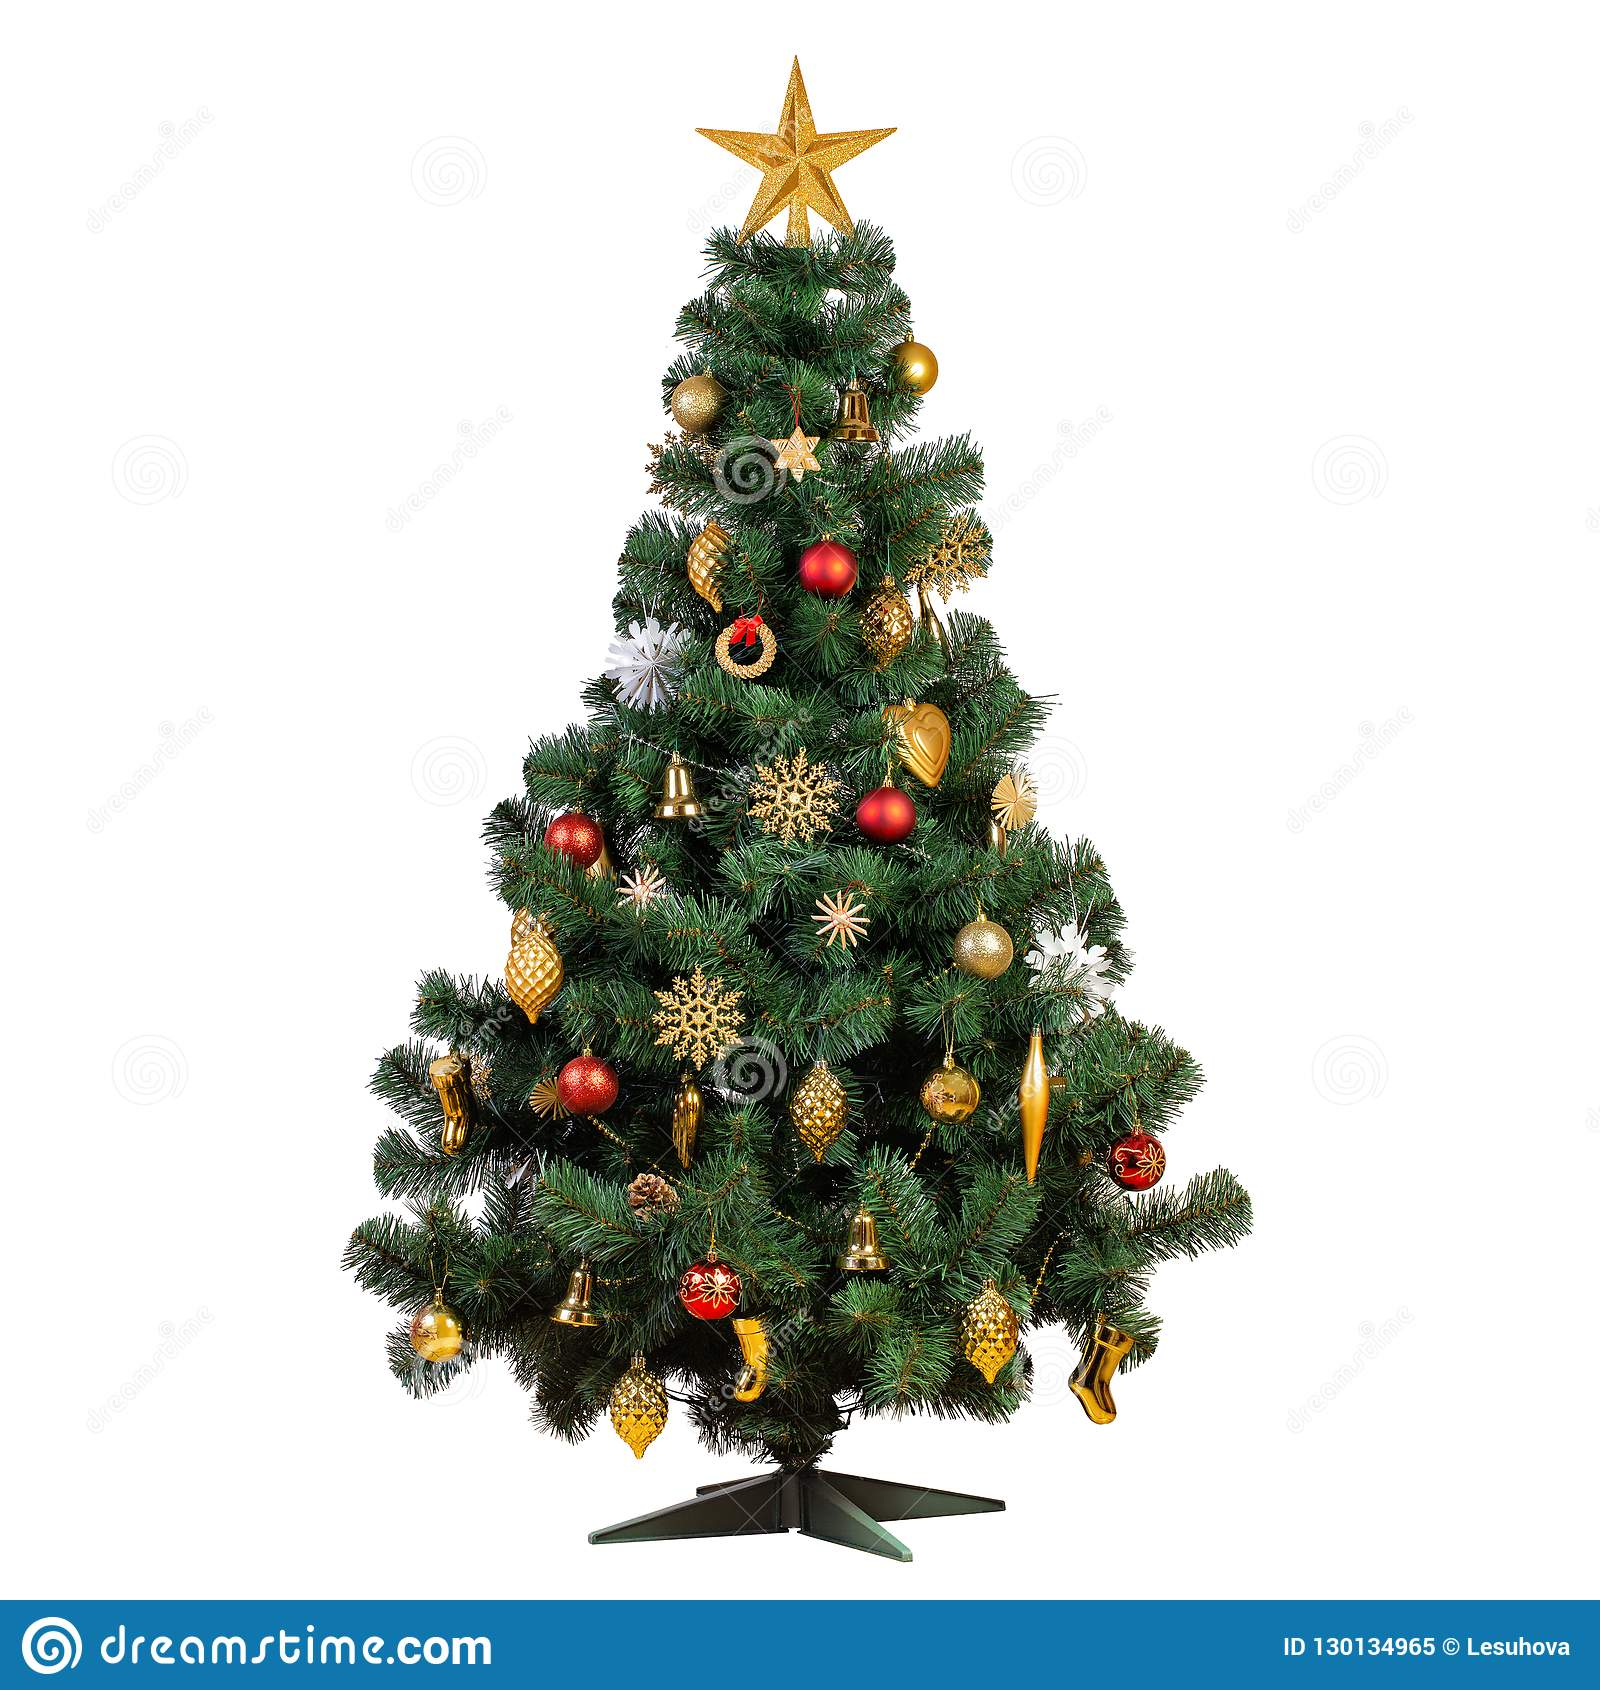 Vintage Artificial Christmas Trees.Artificial Christmas Tree With Beautiful Classic Vintage Decorations